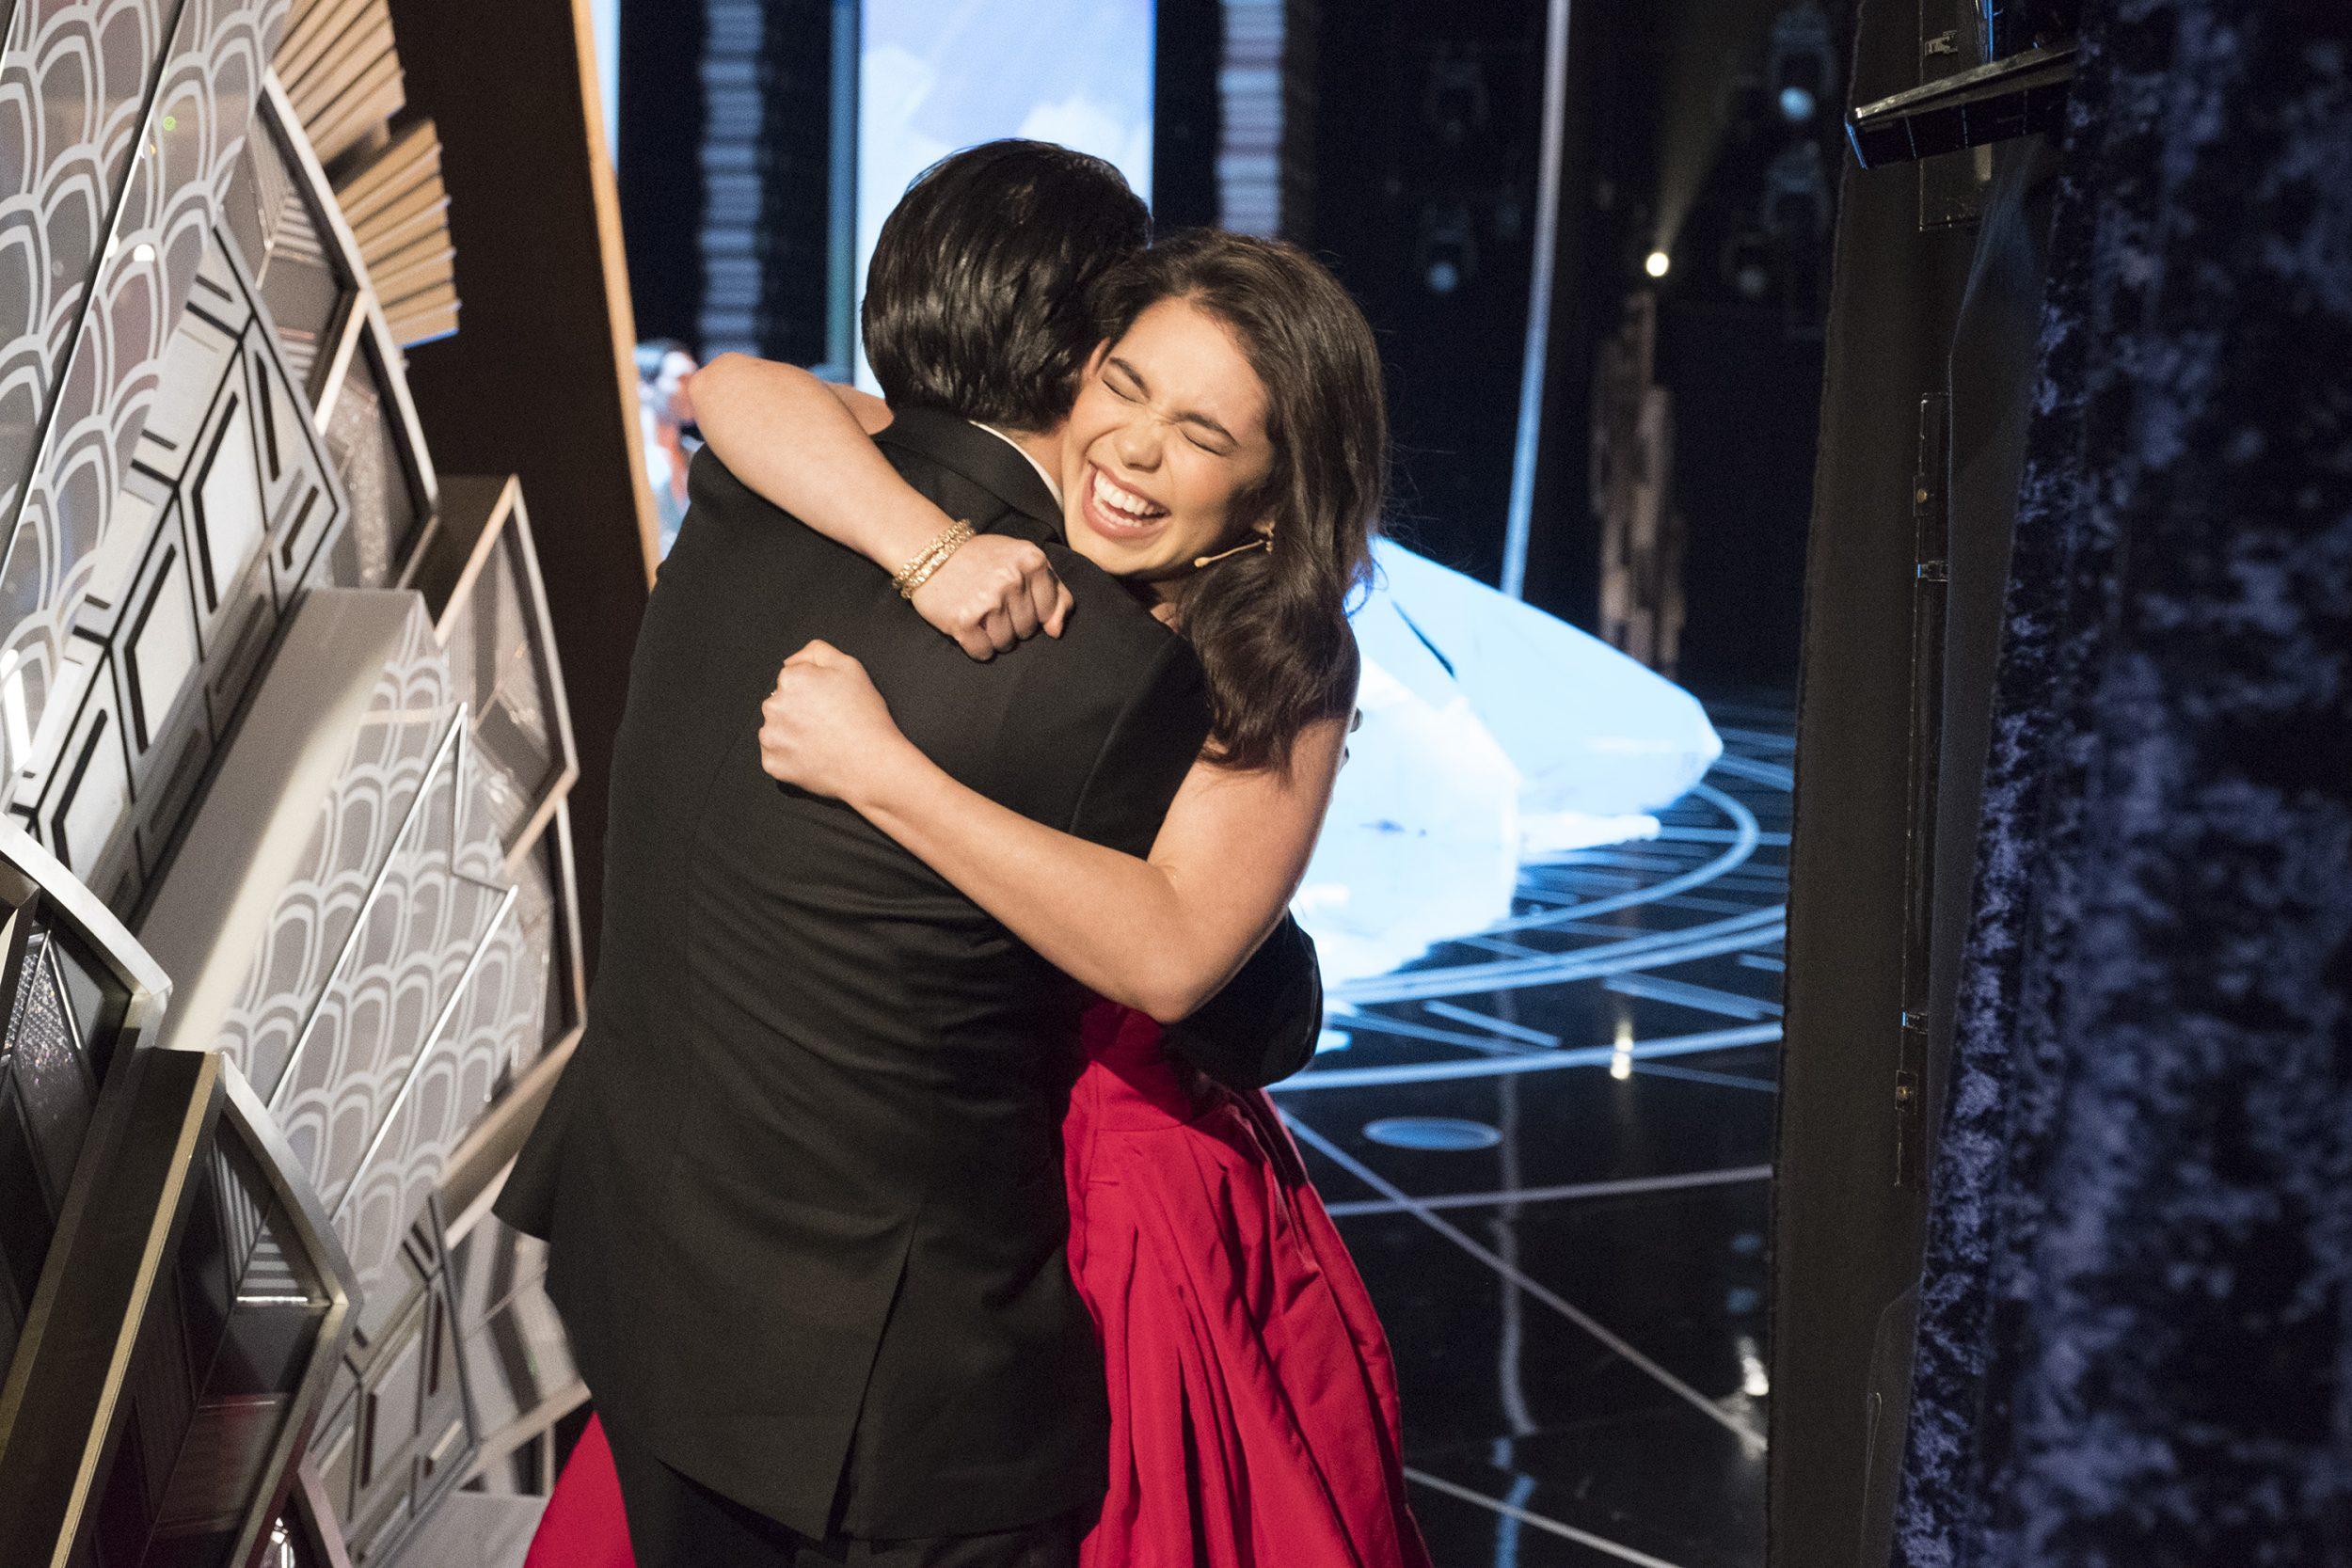 THE OSCARS(r) - The 89th Oscars(r)  broadcasts live on Oscar(r) SUNDAY, FEBRUARY 26, 2017, on the ABC Television Network. (ABC/Adam Rose) LIN-MANUEL MIRANDA, AULI'I CRAVALHO